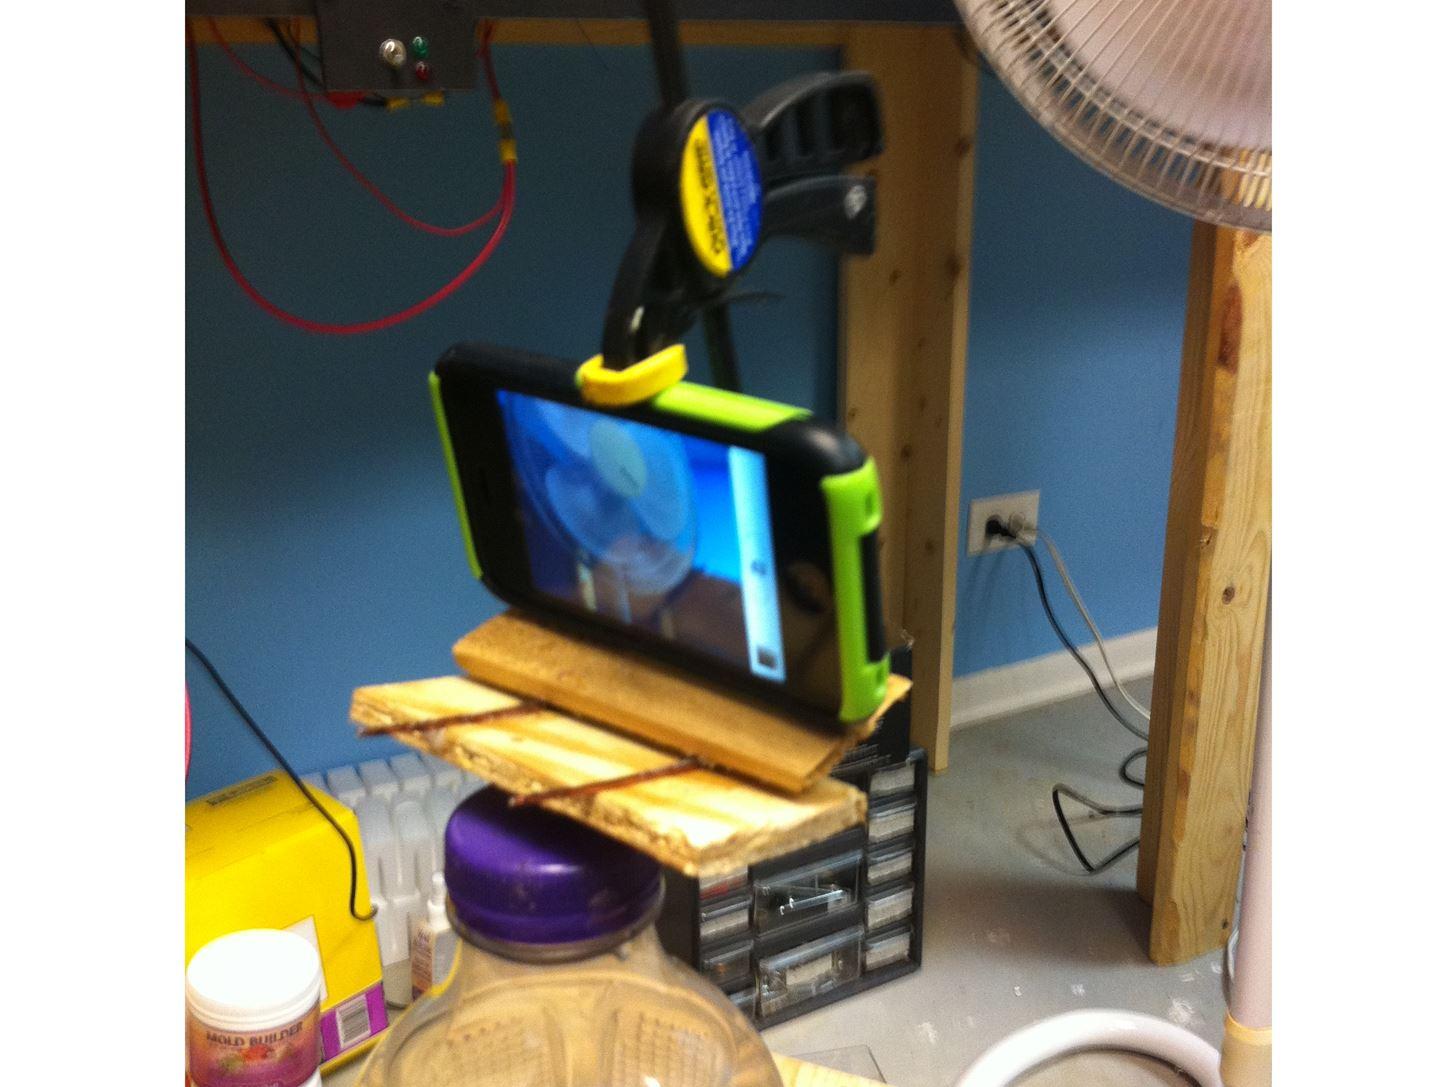 DIY Challenge: Camera tripod with camera phone attachment